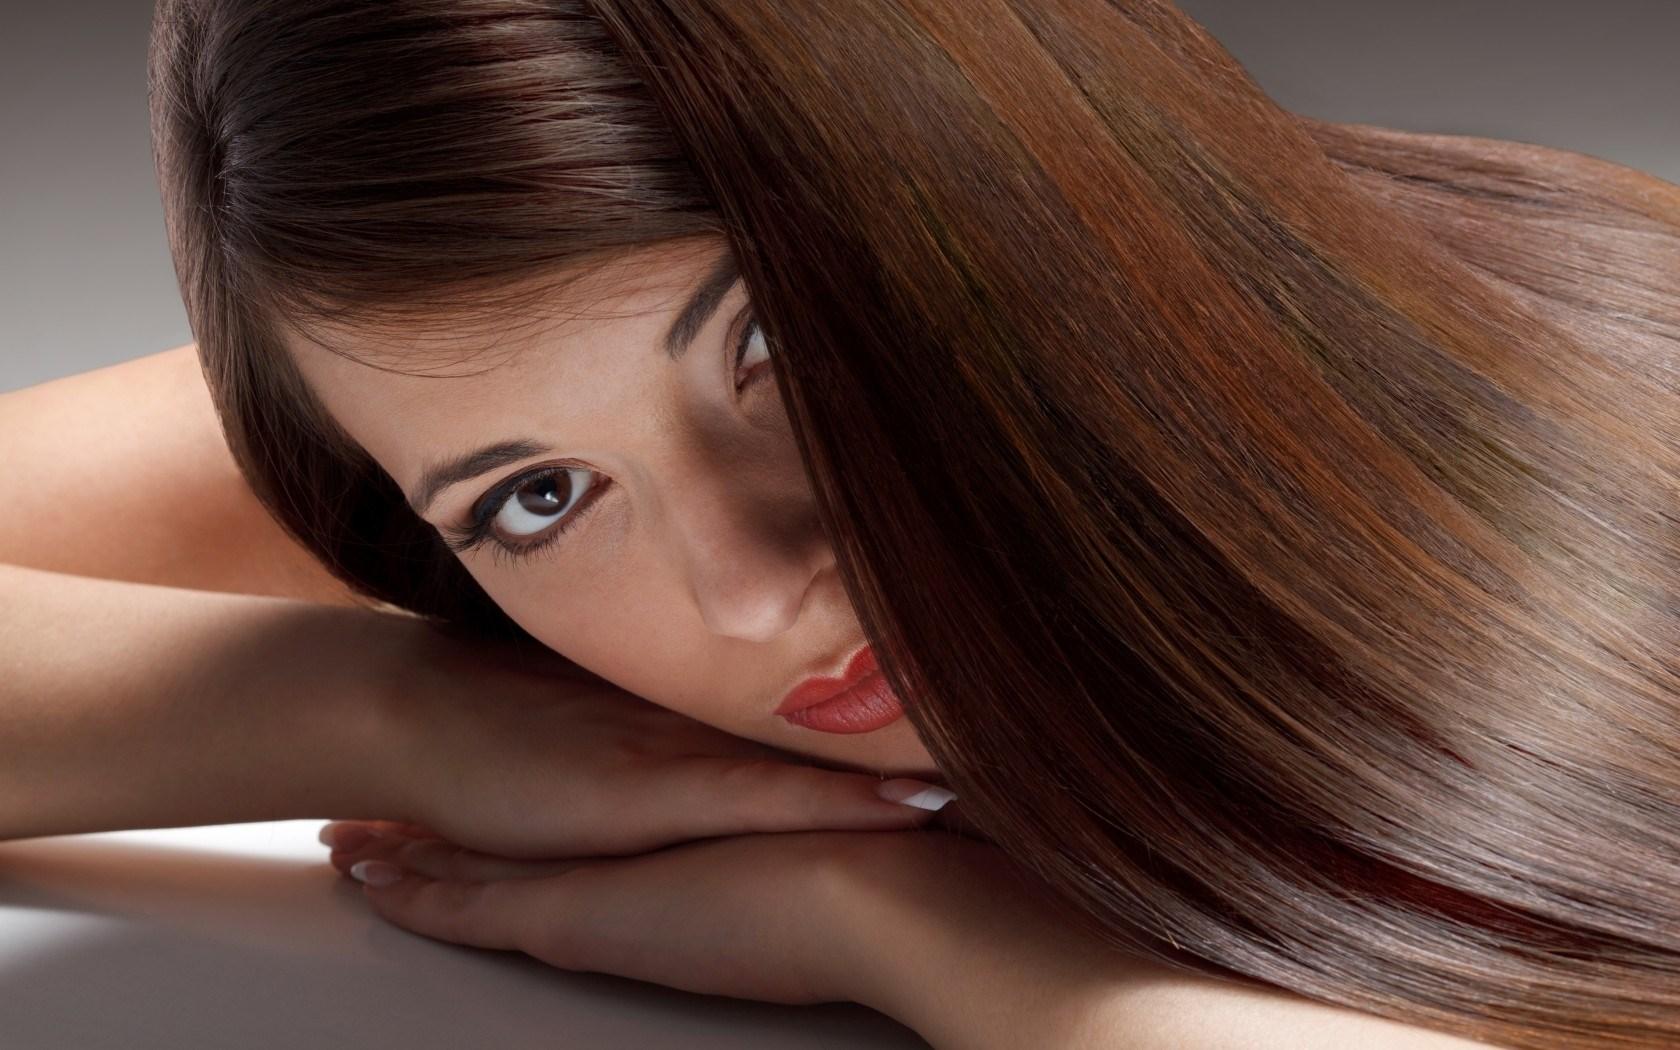 hair-1080p-windows-wallpaper-wpc9205654